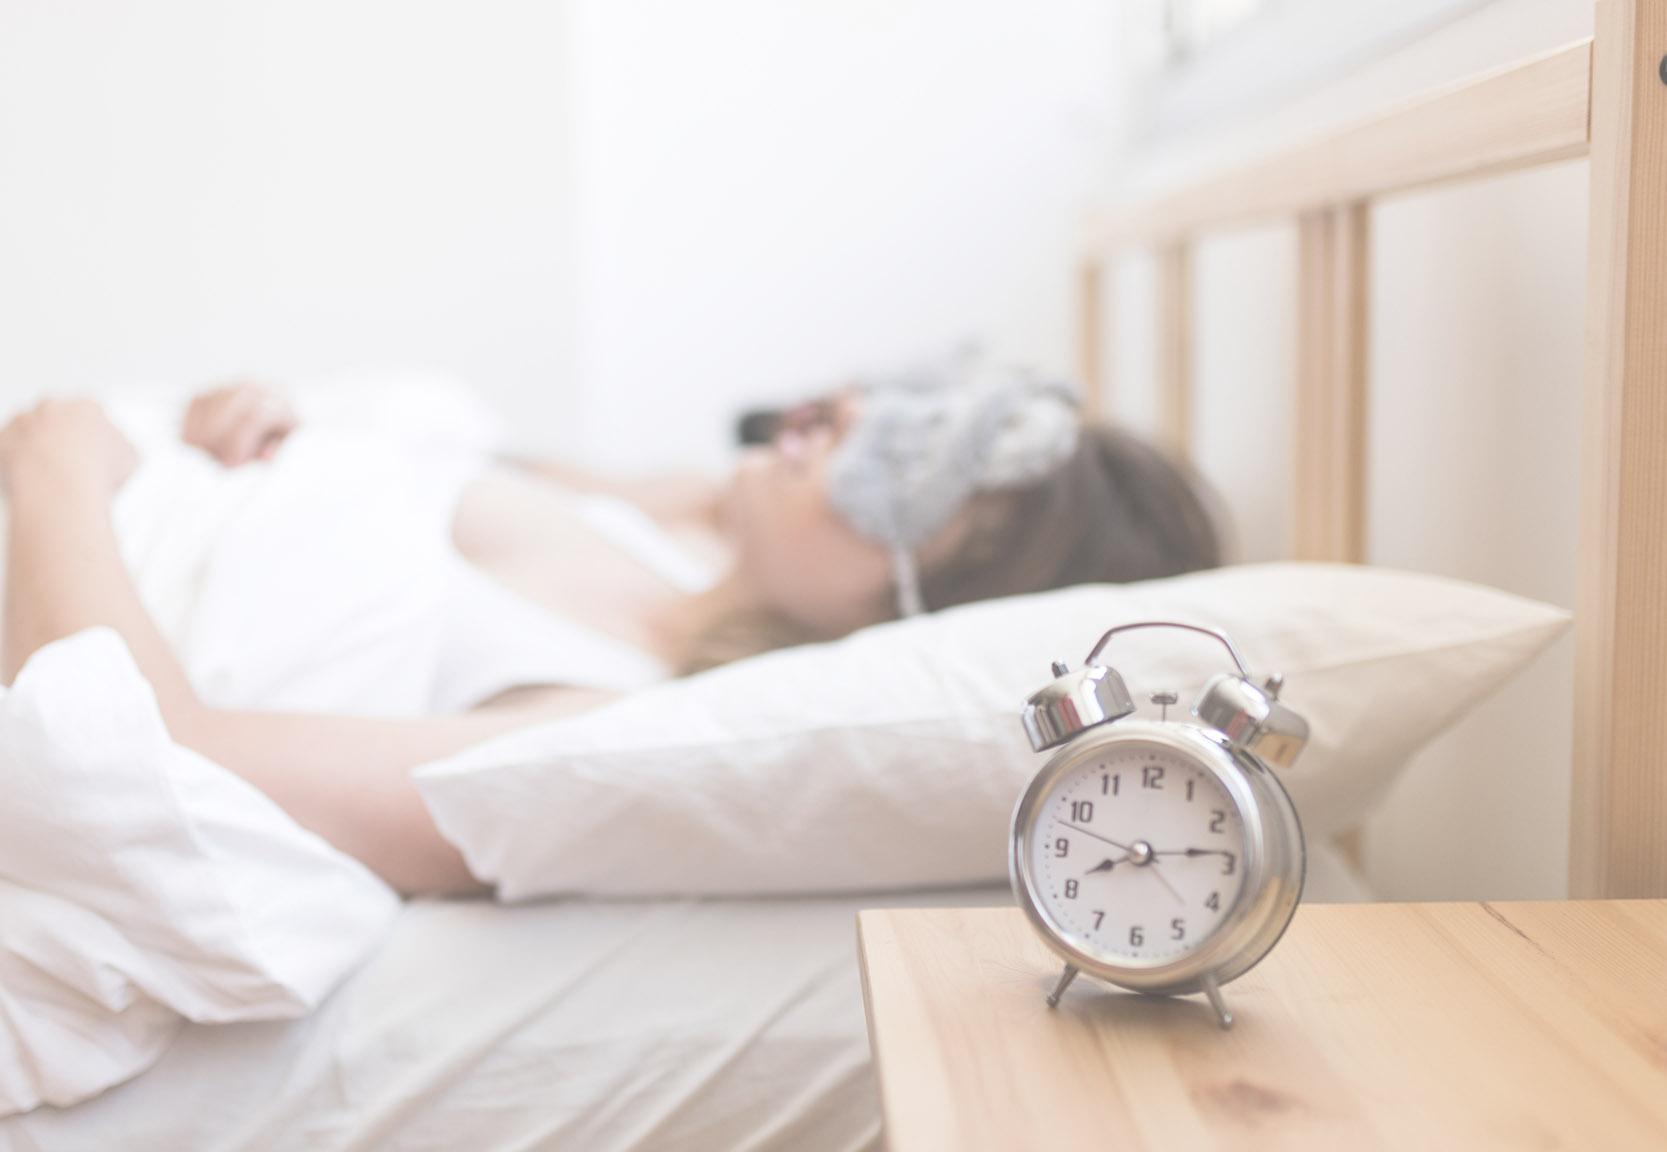 3 Handige tips om beter te slapen